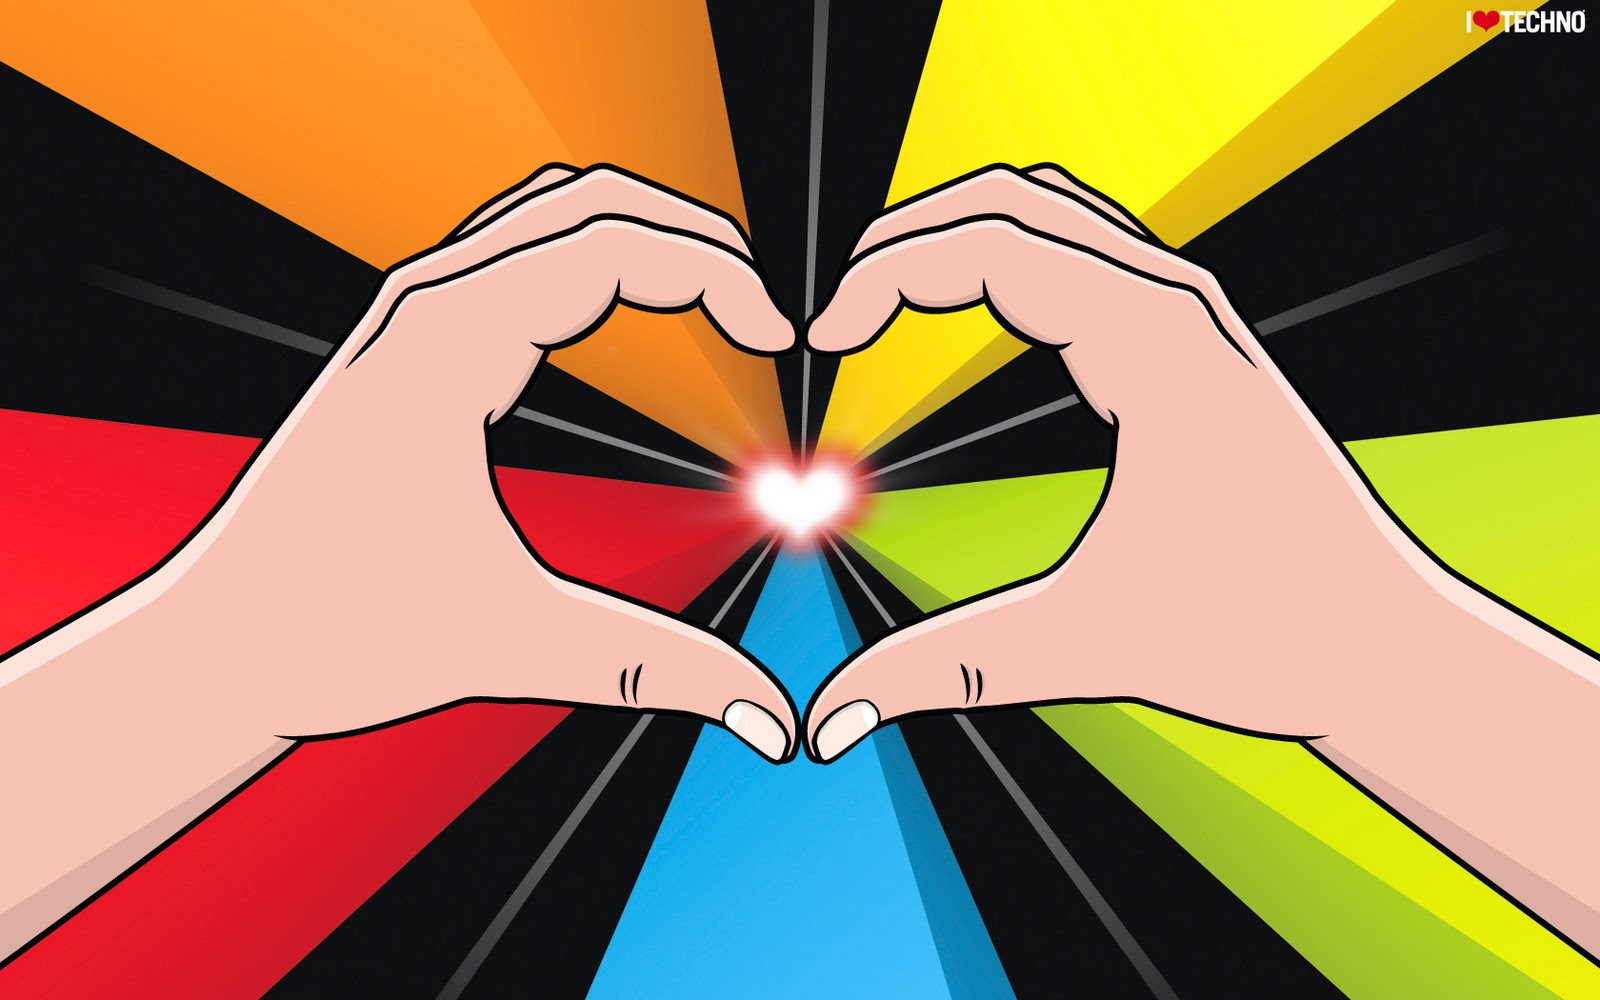 http://2.bp.blogspot.com/_R5XLL0huH0I/TOSQ8H9EjYI/AAAAAAAAAZ0/JFiWTj-OtY8/s1600/I_Love_Techno_2010_Wallpaper.jpg